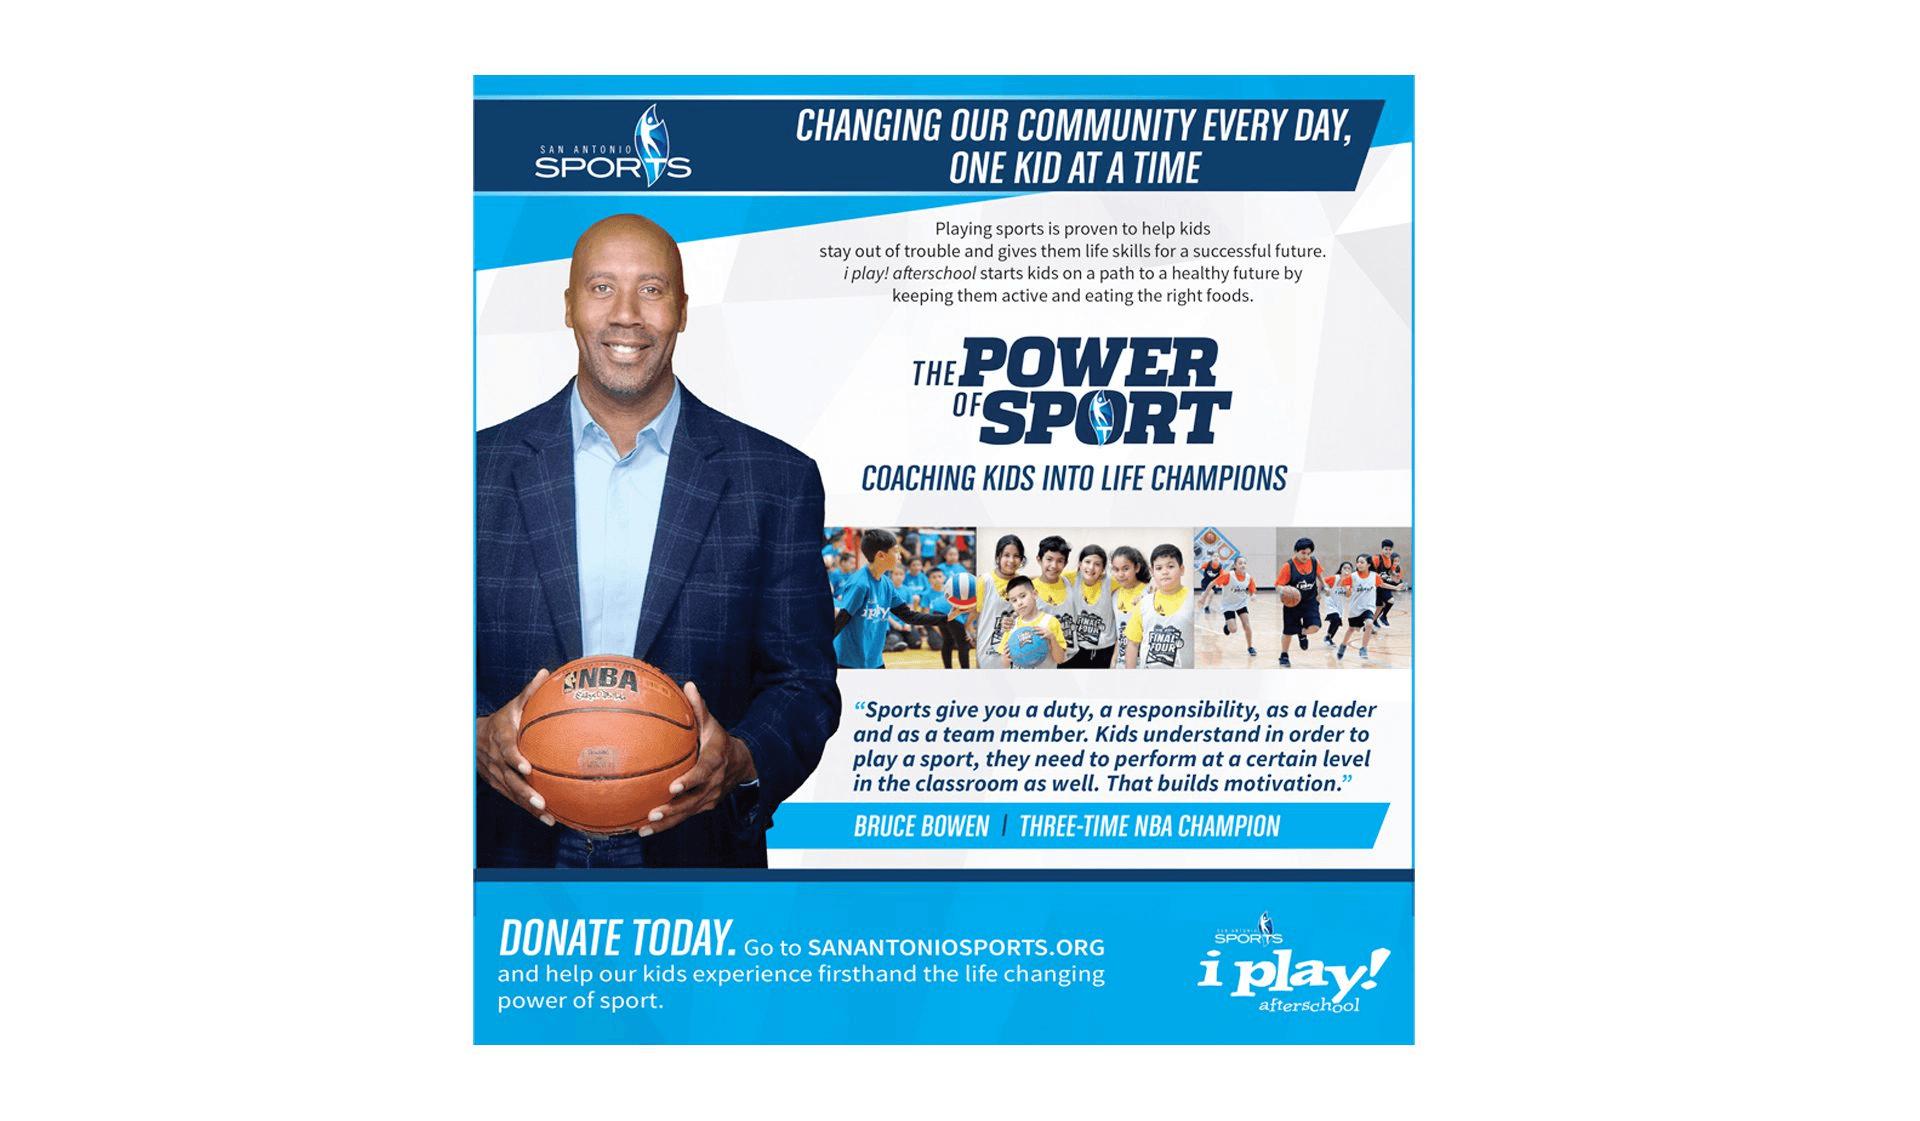 SA Sports Print Ad with Bruce Bowen